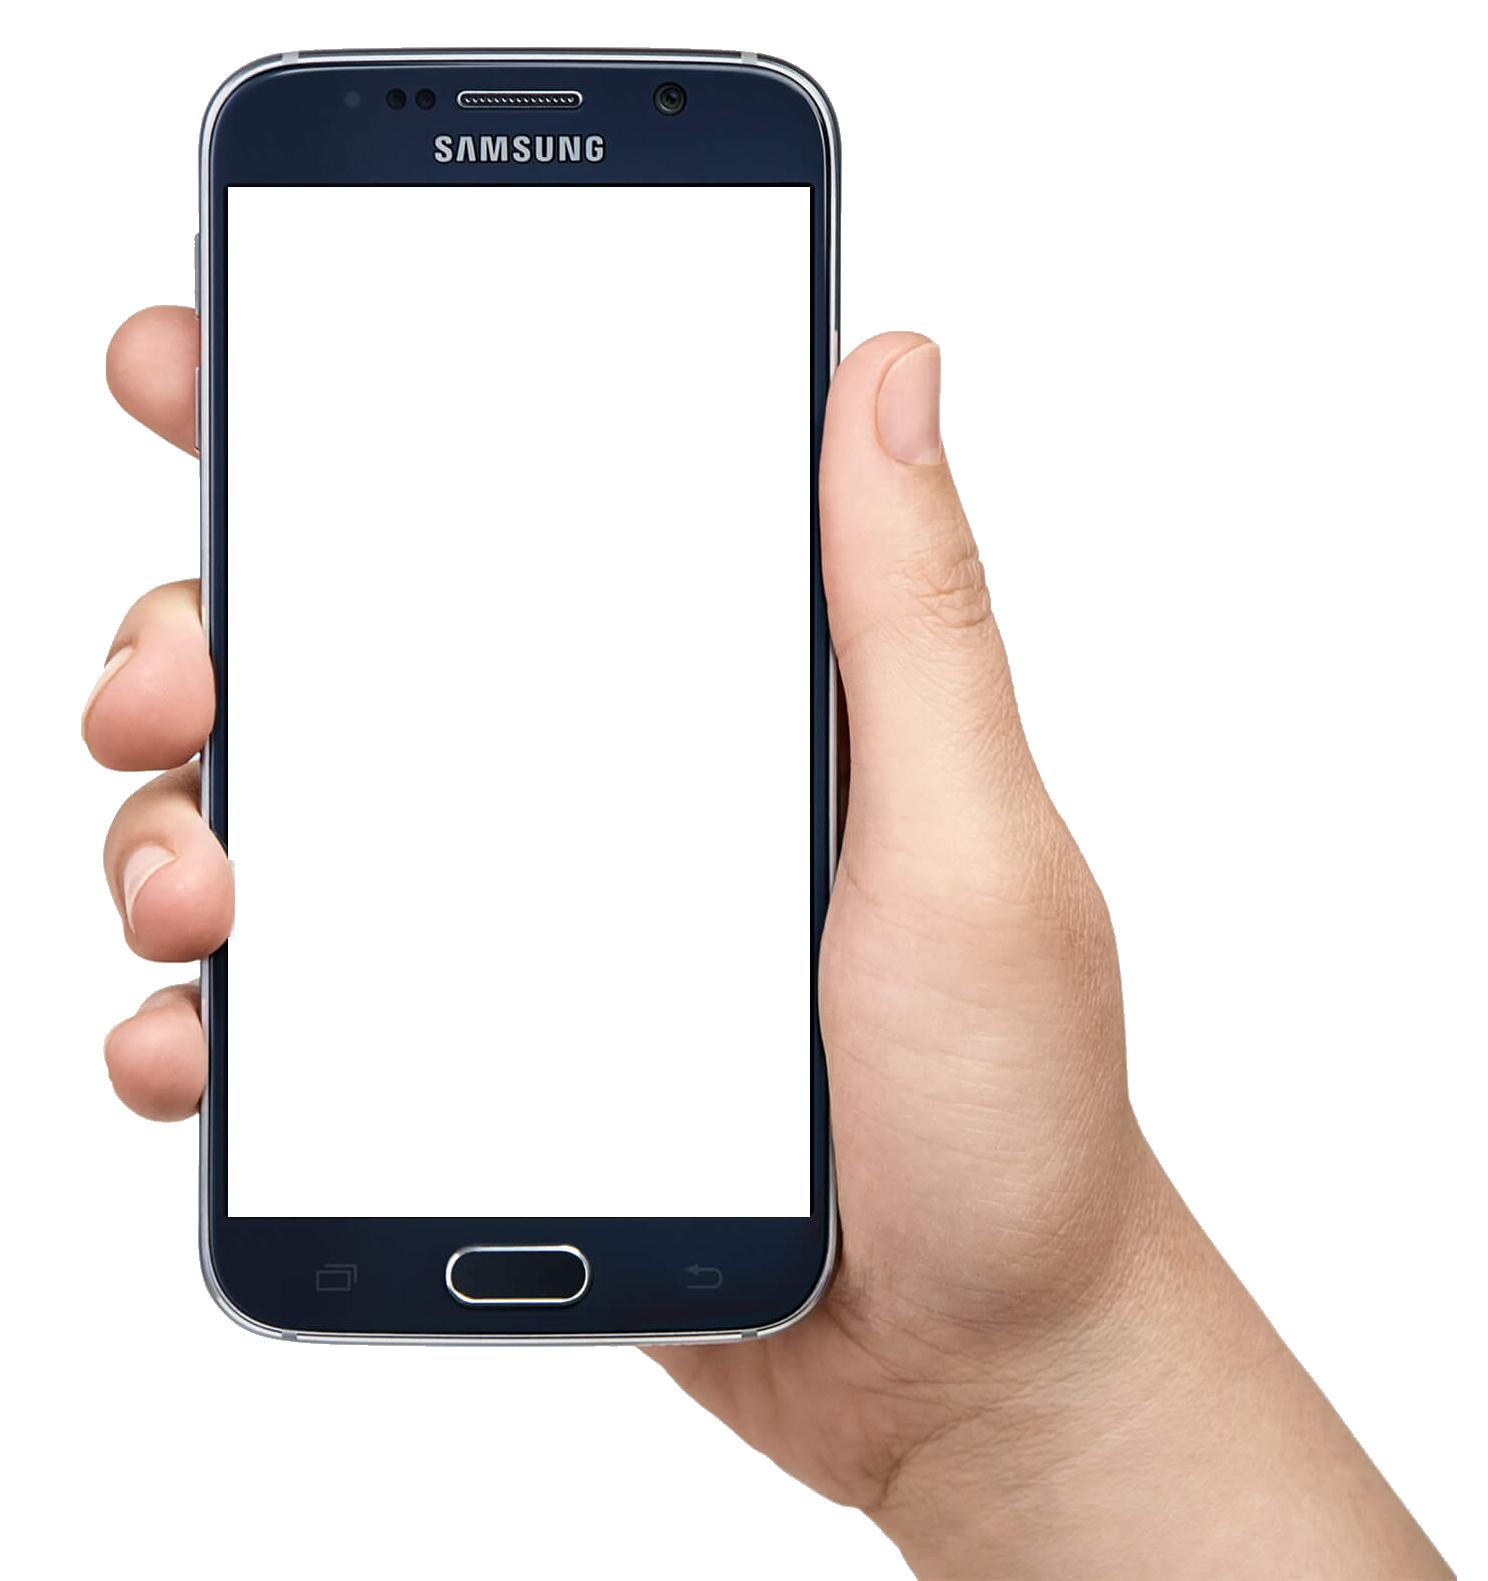 Samsung Mobile Png Hand - HD Wallpaper